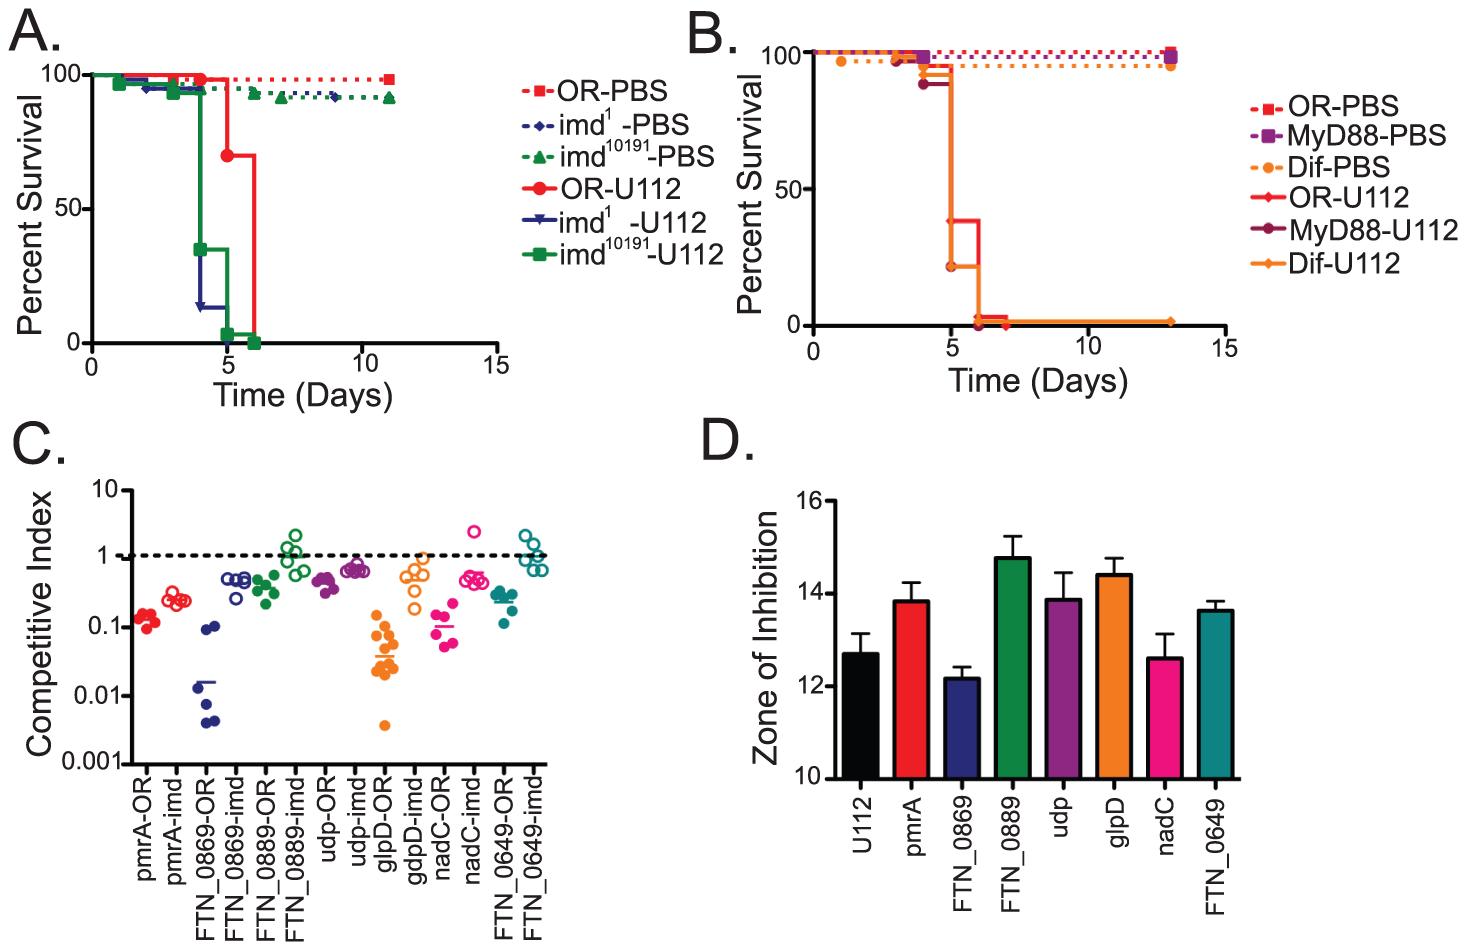 Negative selection screens in Drosophila immunity mutants identify <i>F. novicida</i> mutants that help the bacteria resist the imd-regulated host innate immune response.